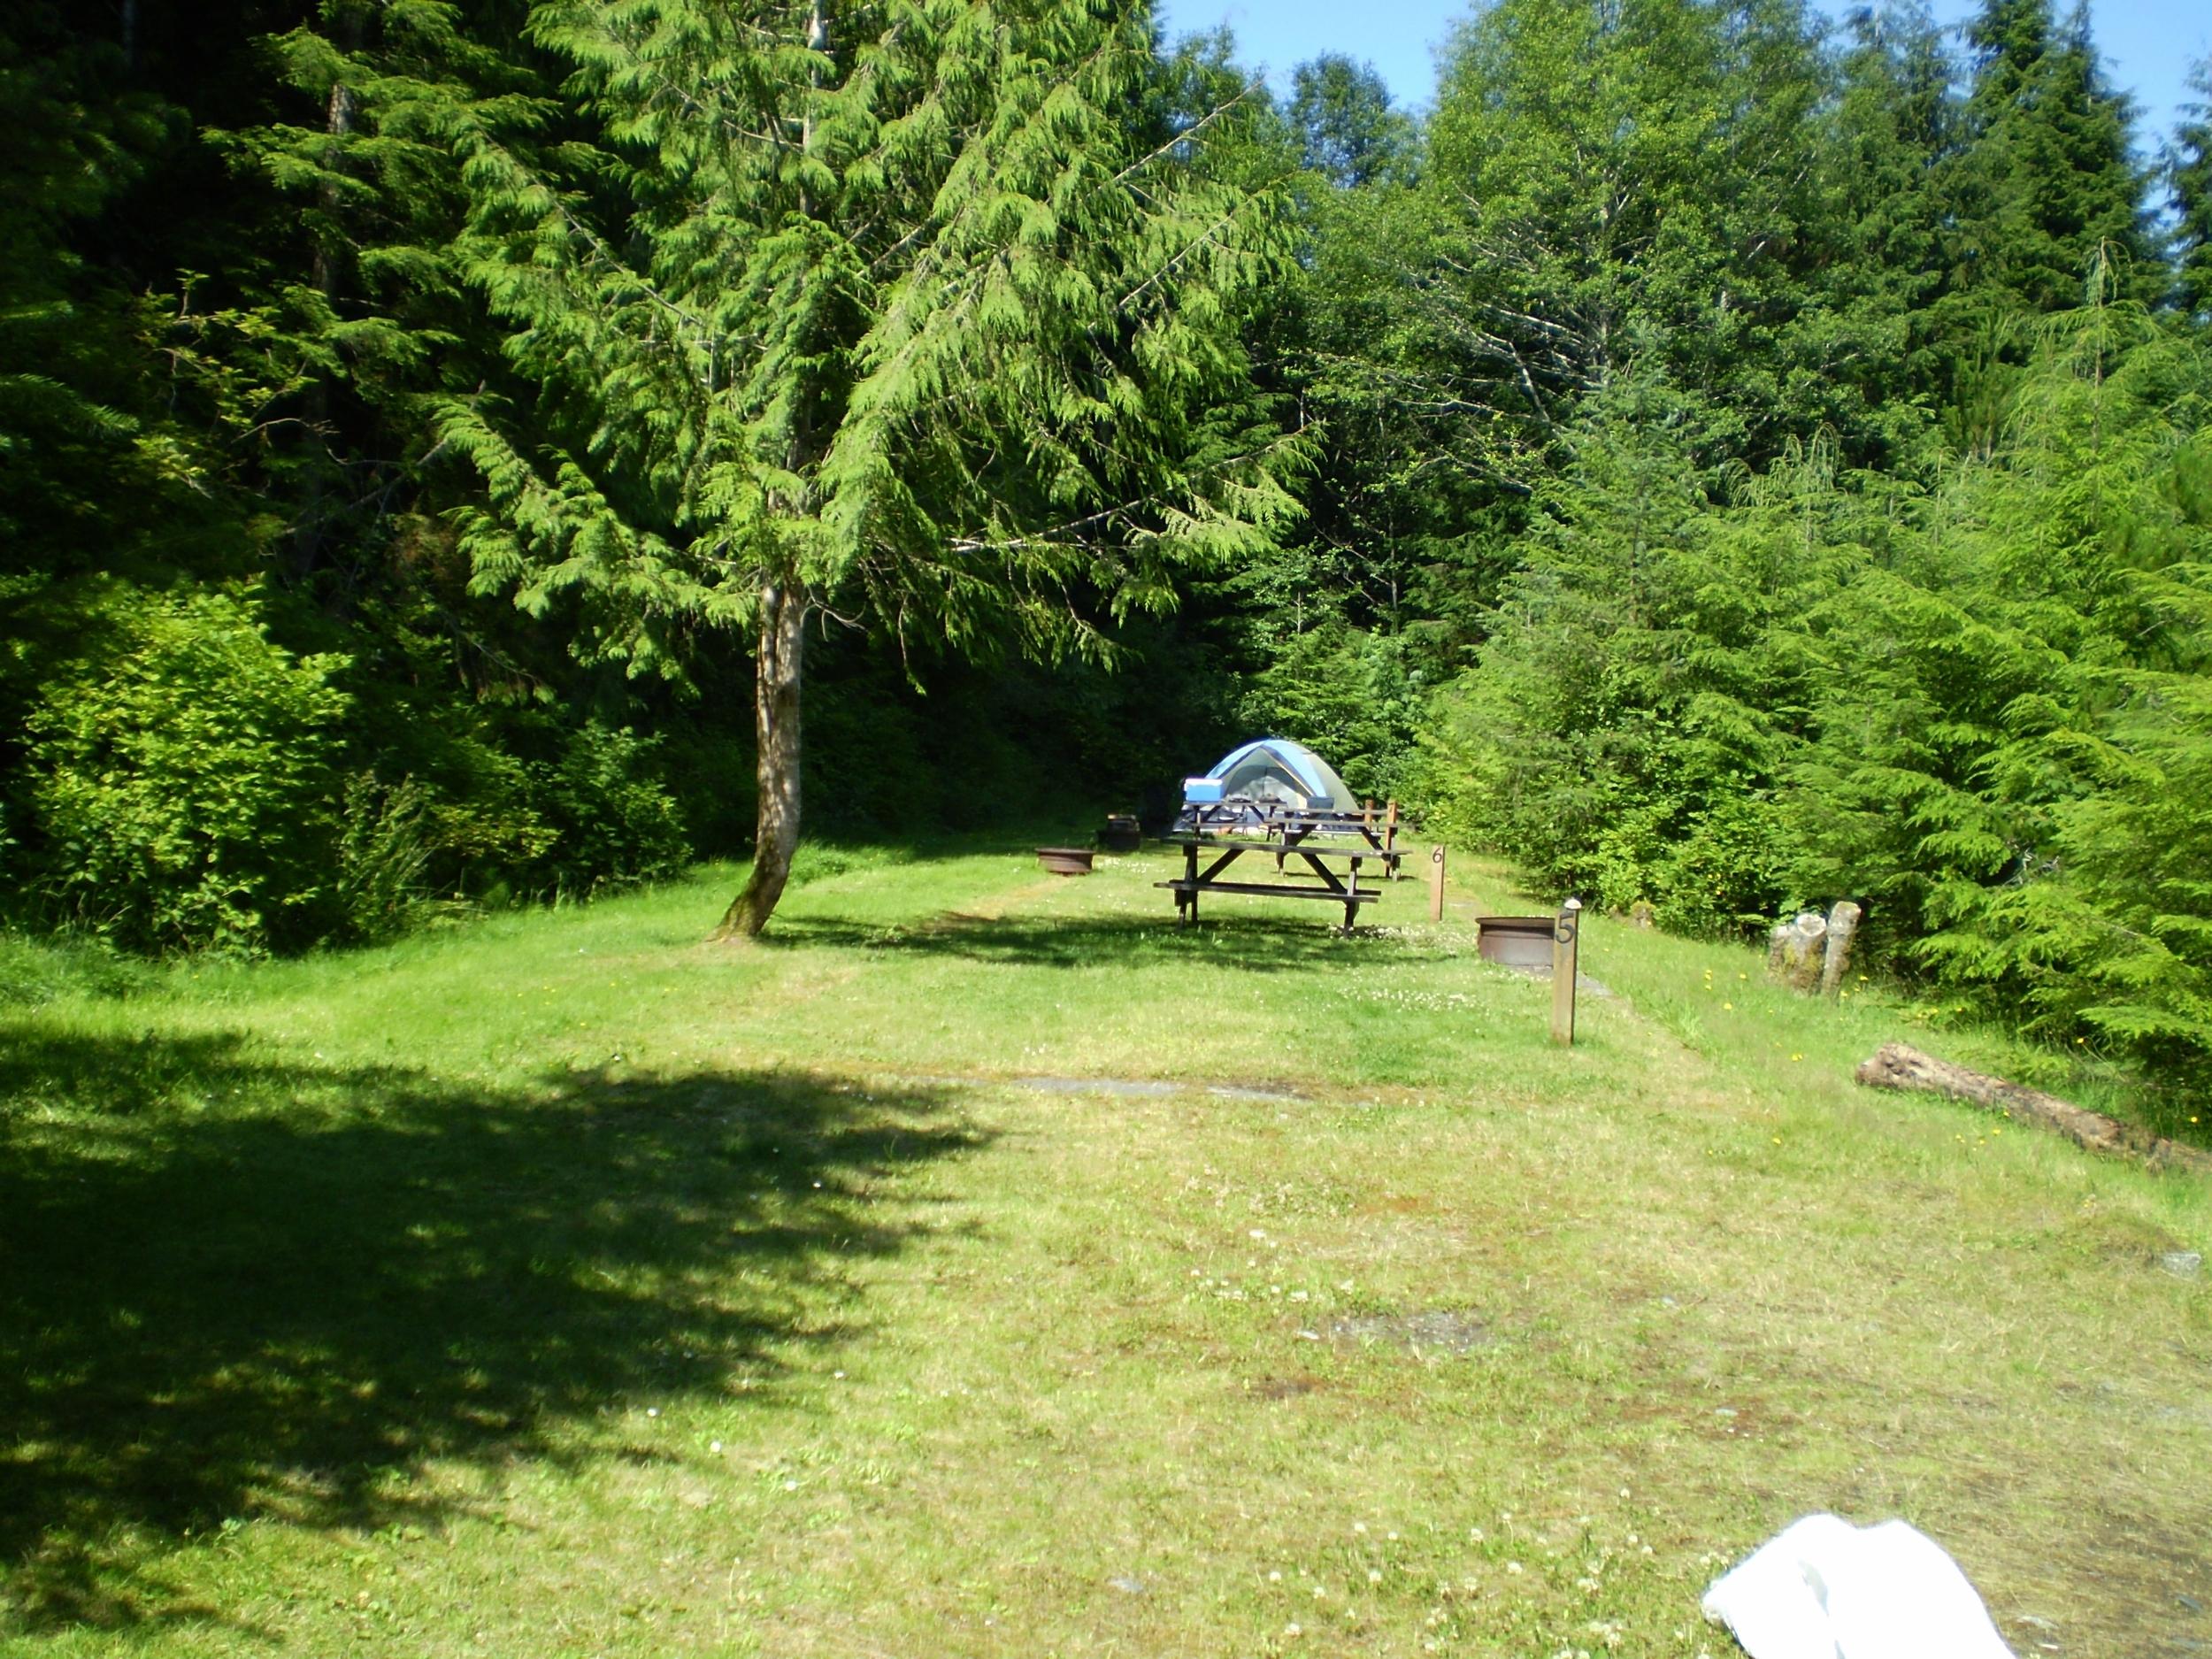 Campsite Tent Area